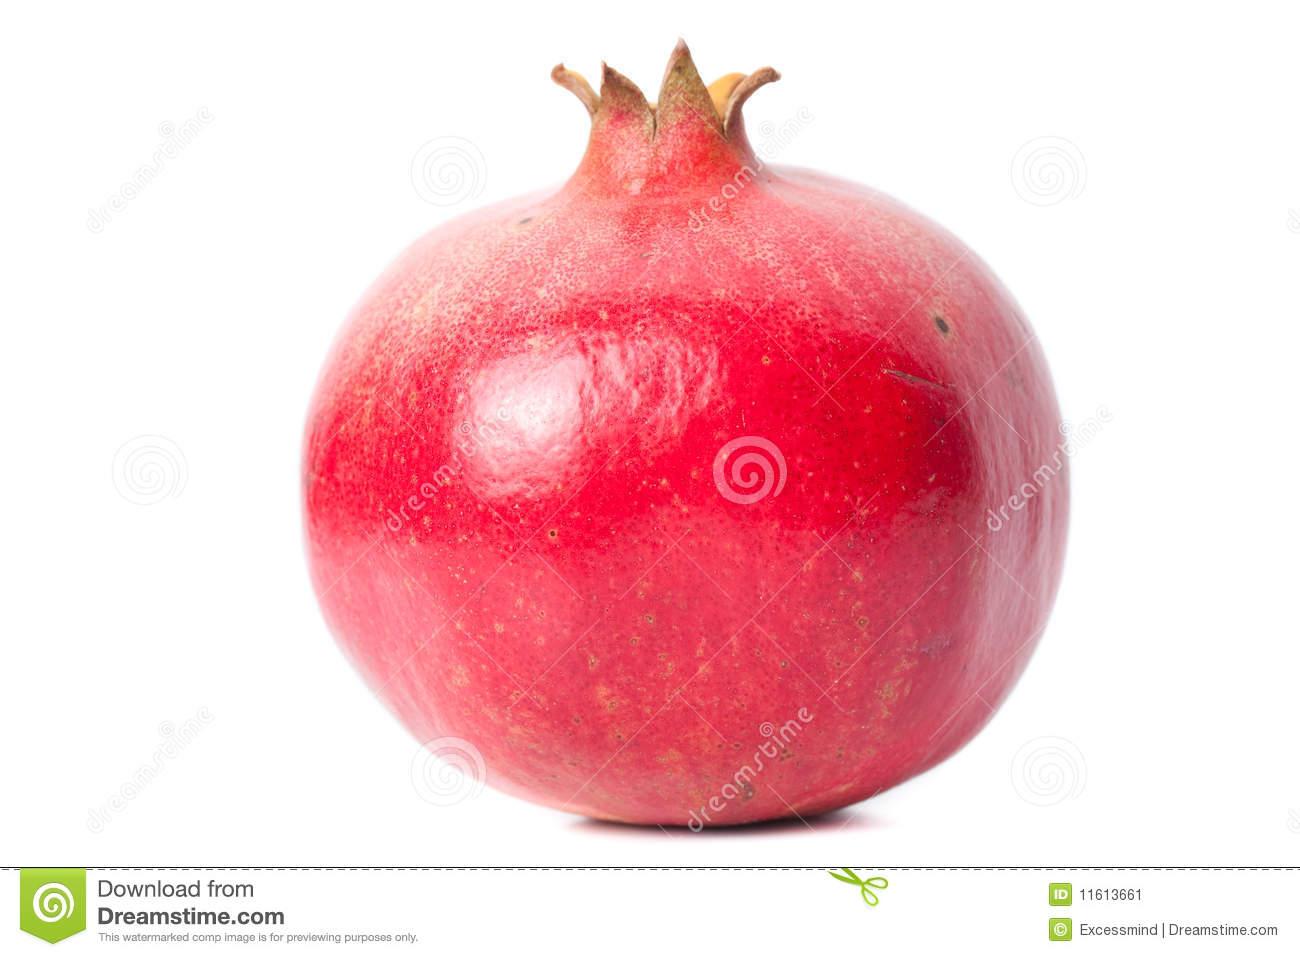 Pomegranate Clipart - Clipart Suggest